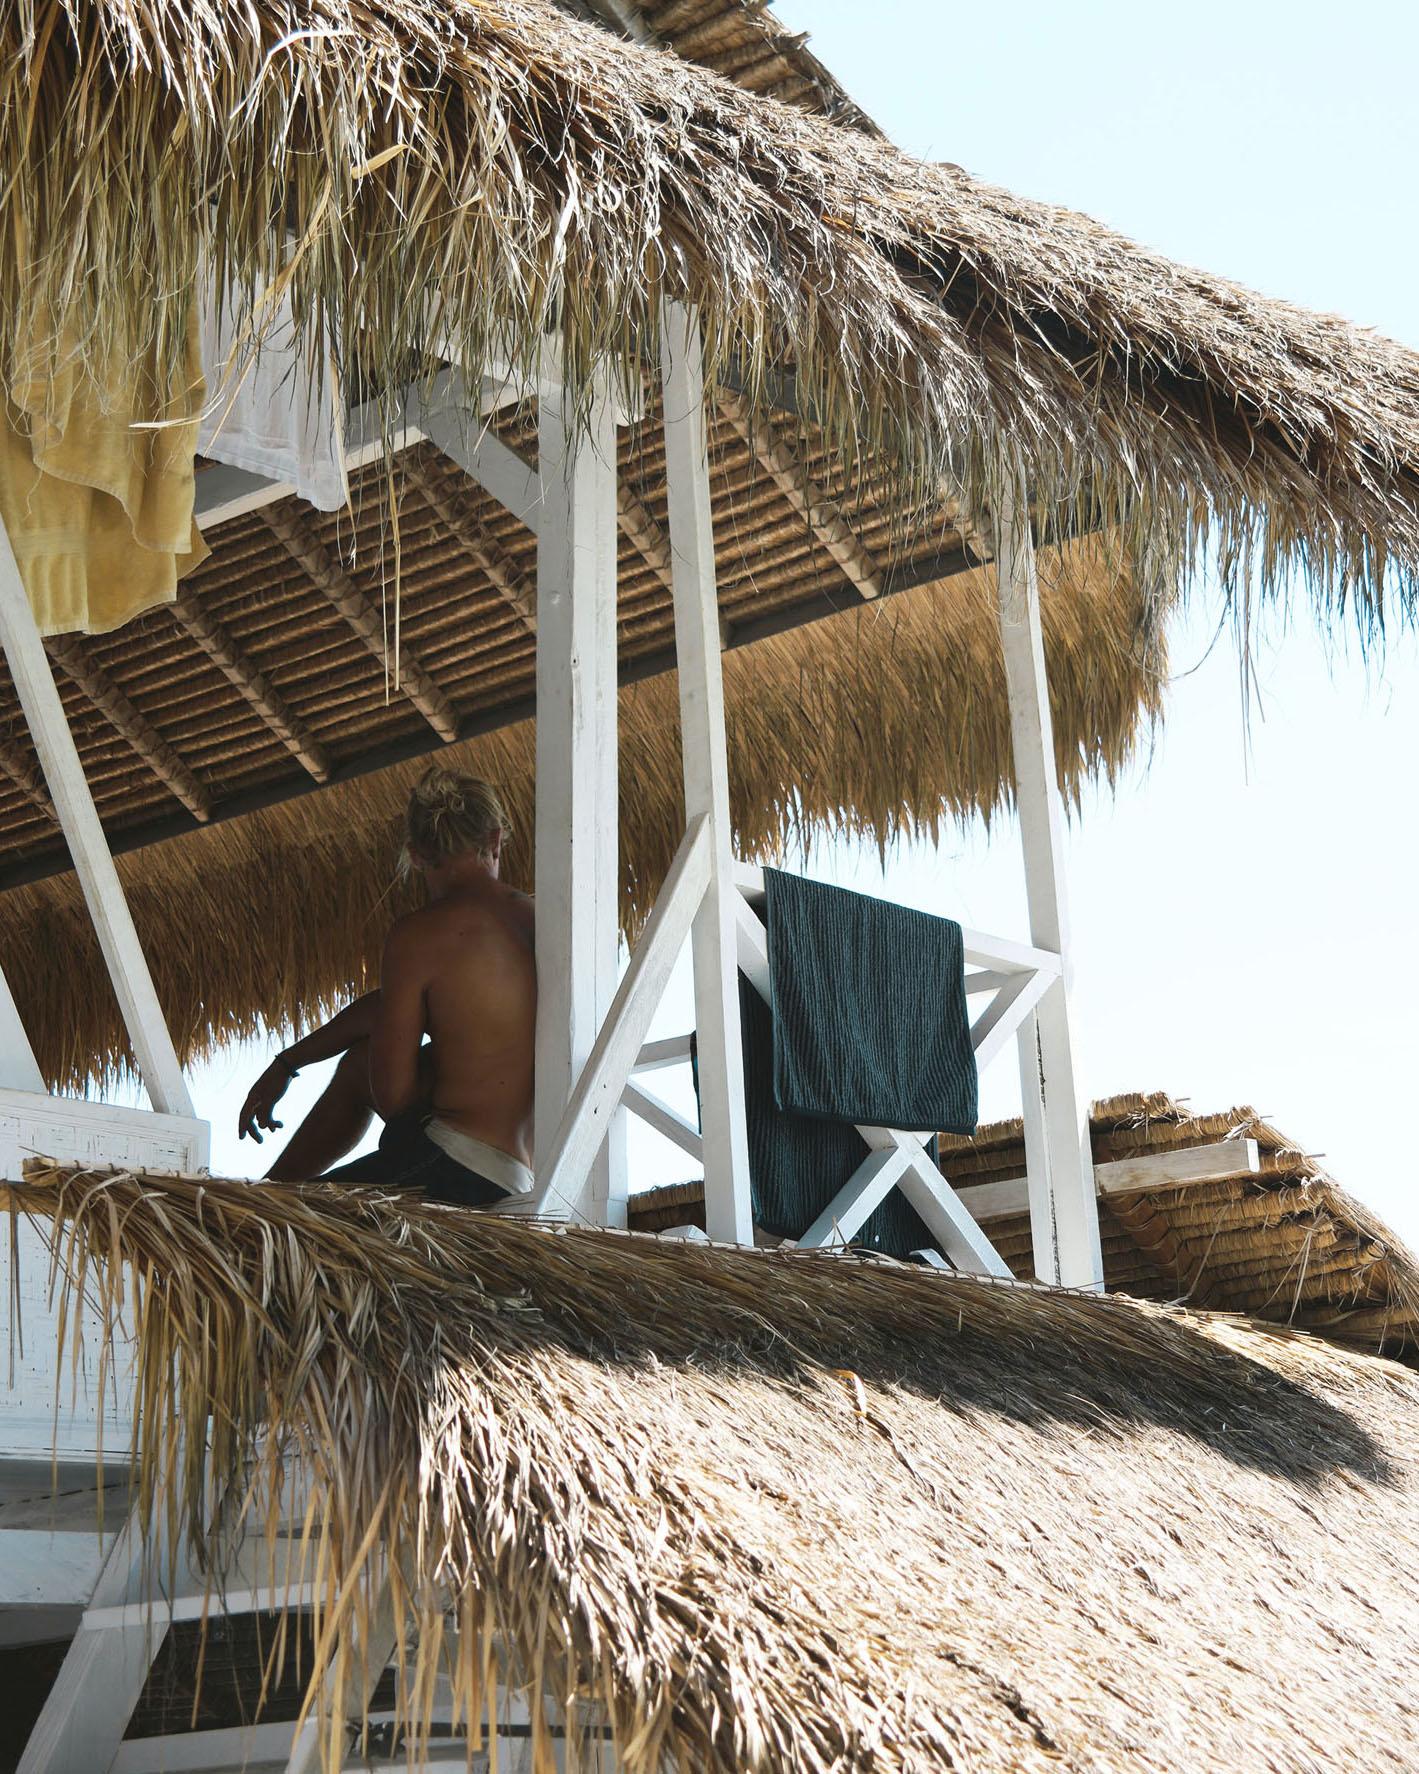 bali-guide-top-5-bali-beaches 02.jpg